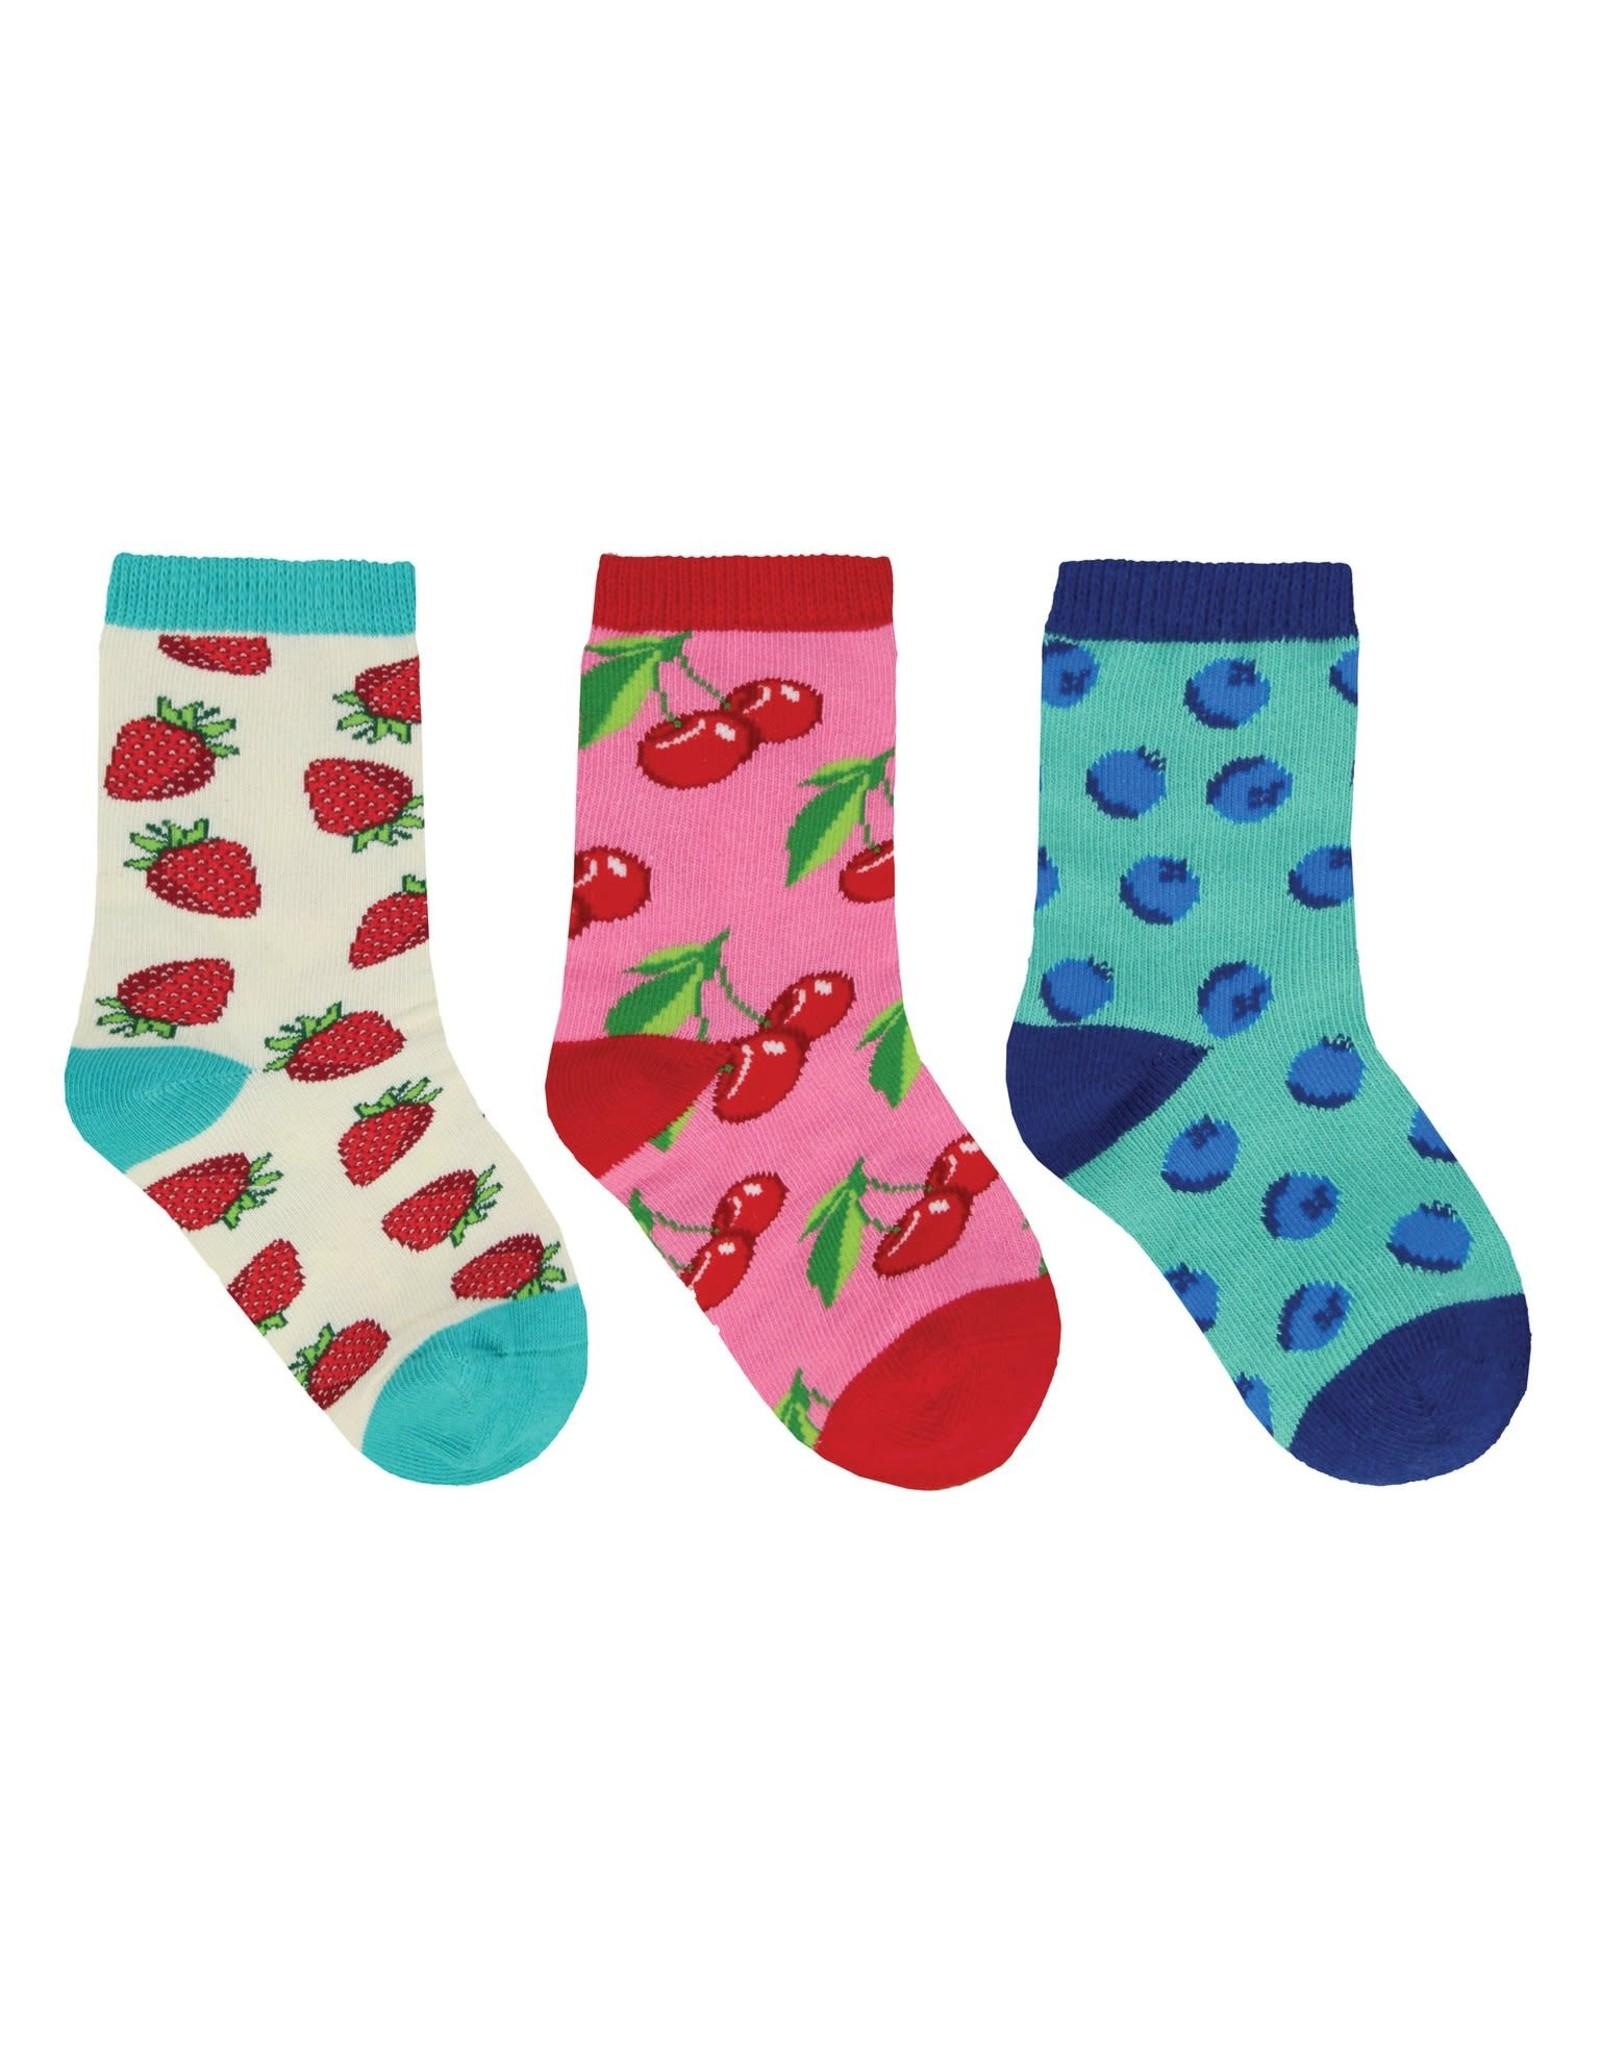 Socksmith Mini Berry Baby Socks, 3 Pack